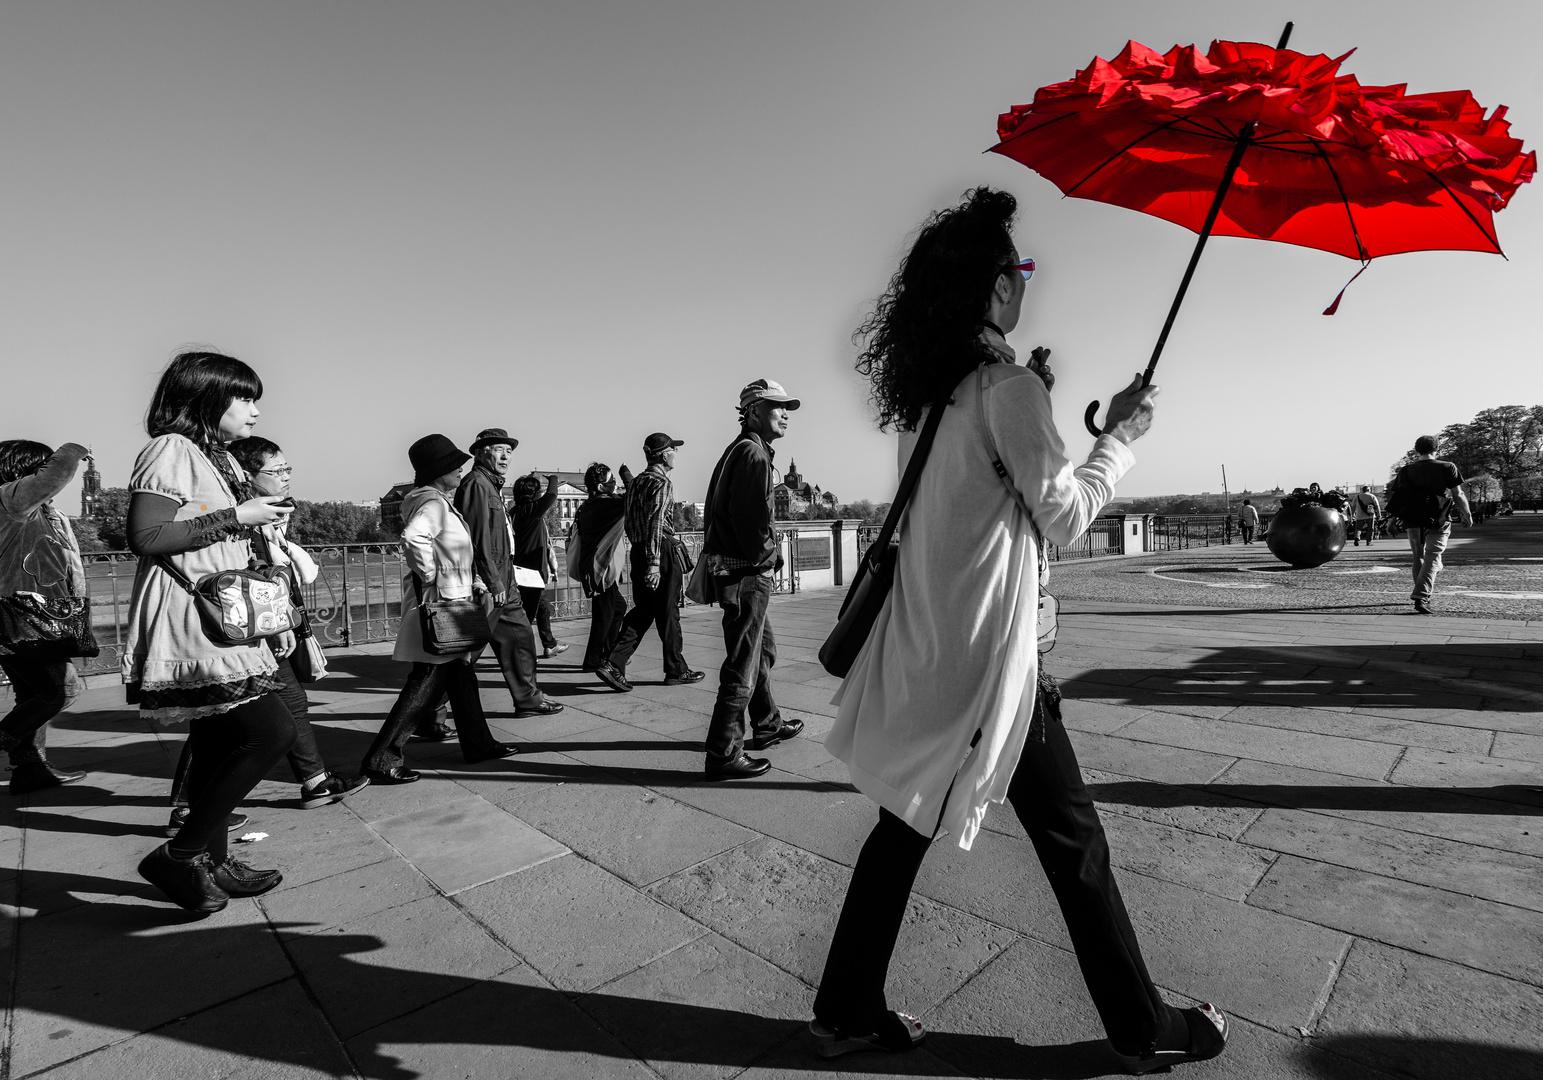 please follow the red umbrella